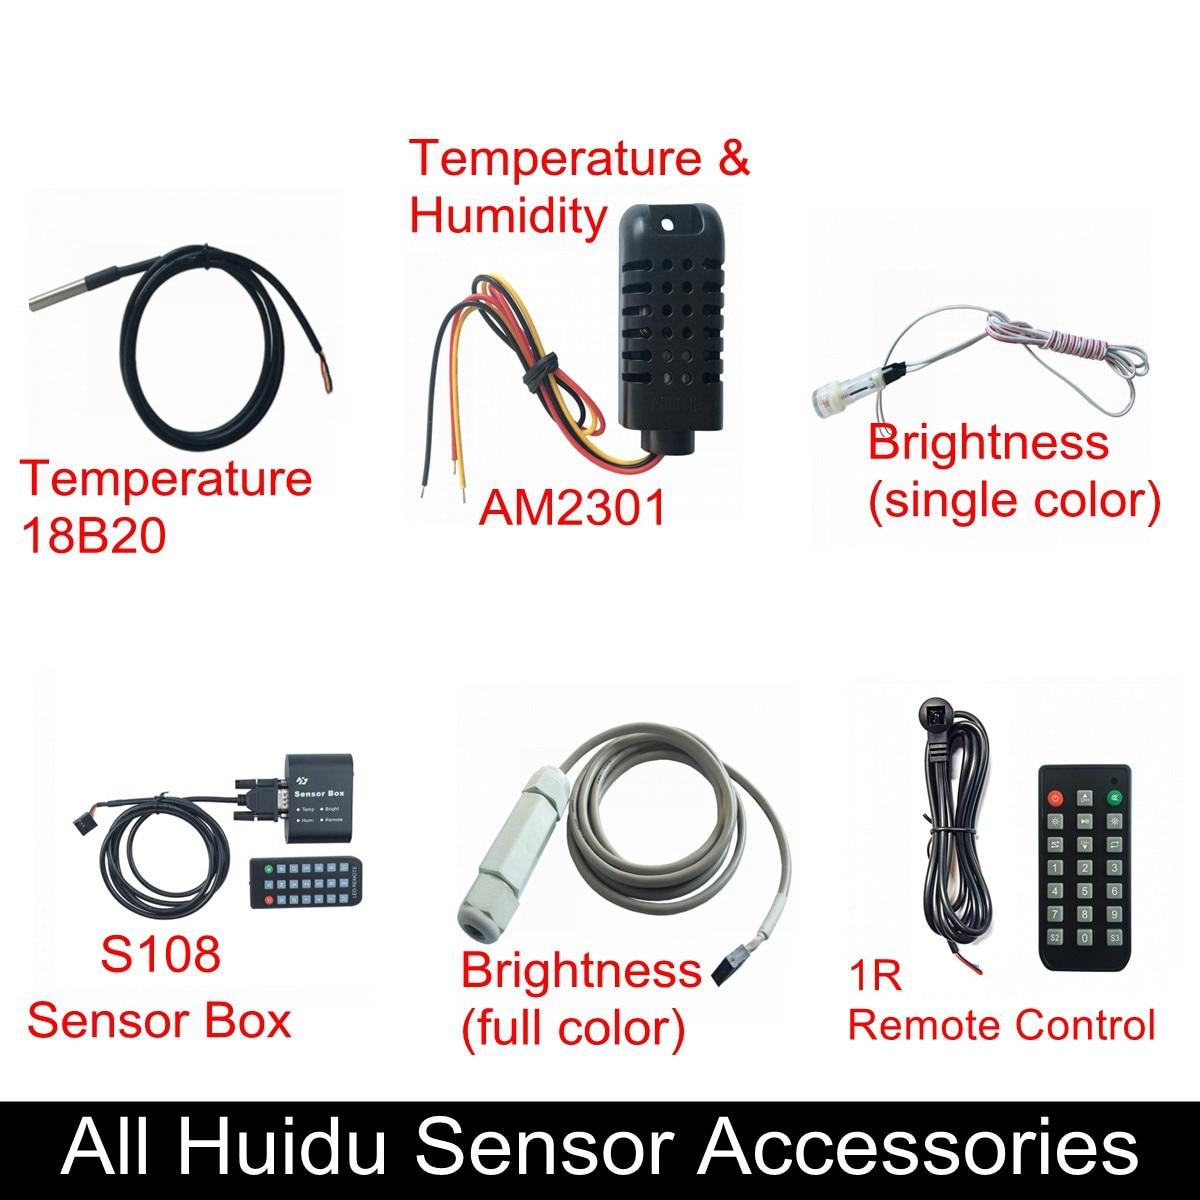 All Huidu Sensors Temperature 18B20 Temperature & Humidity AM2301Single RGB Brightness S108 Box 1R Remote